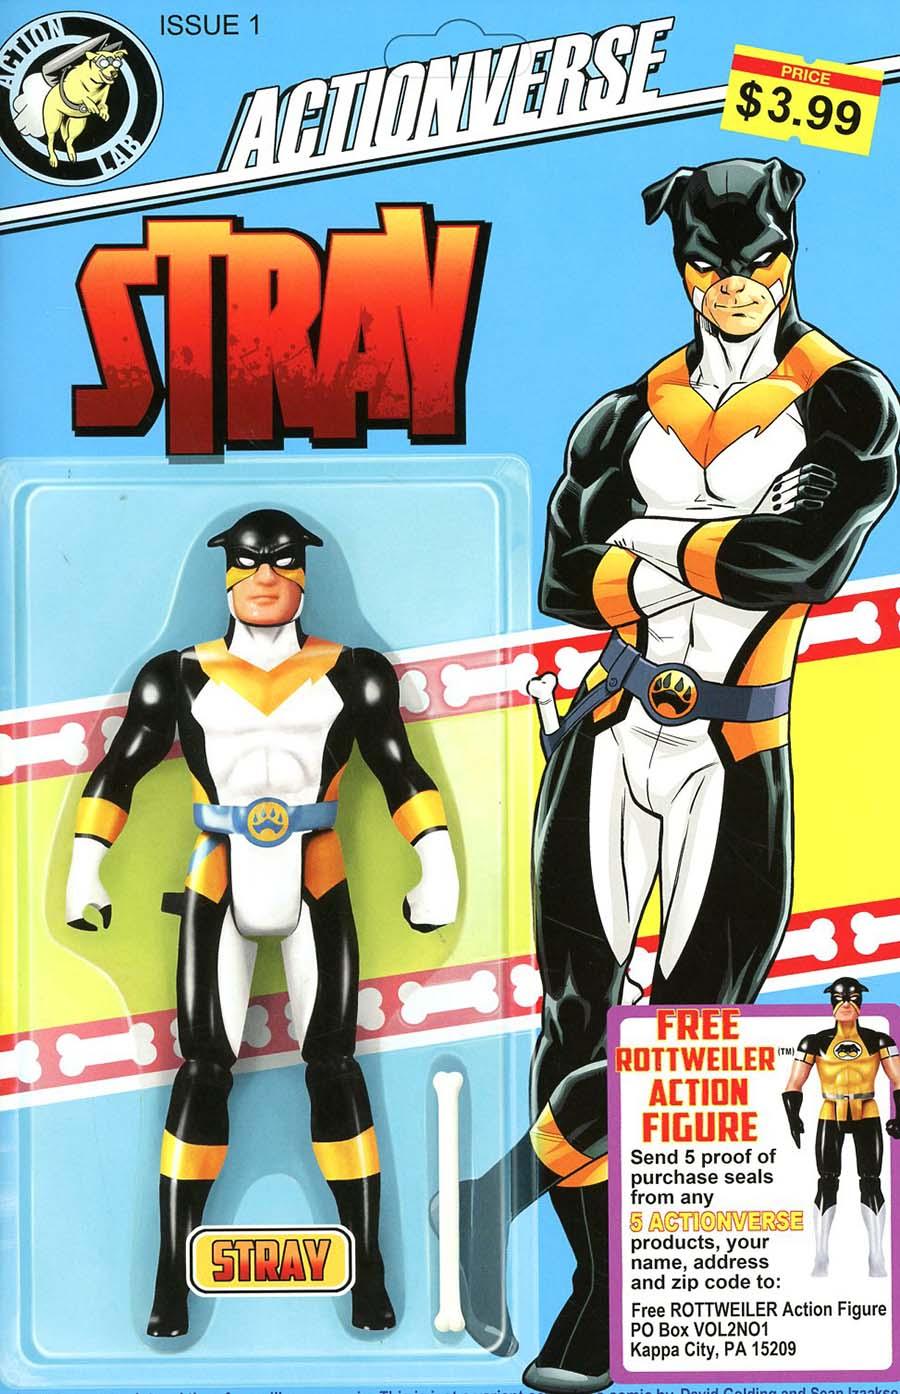 Actionverse Vol 2 #1 Stray Cover B Variant David Golding Cover